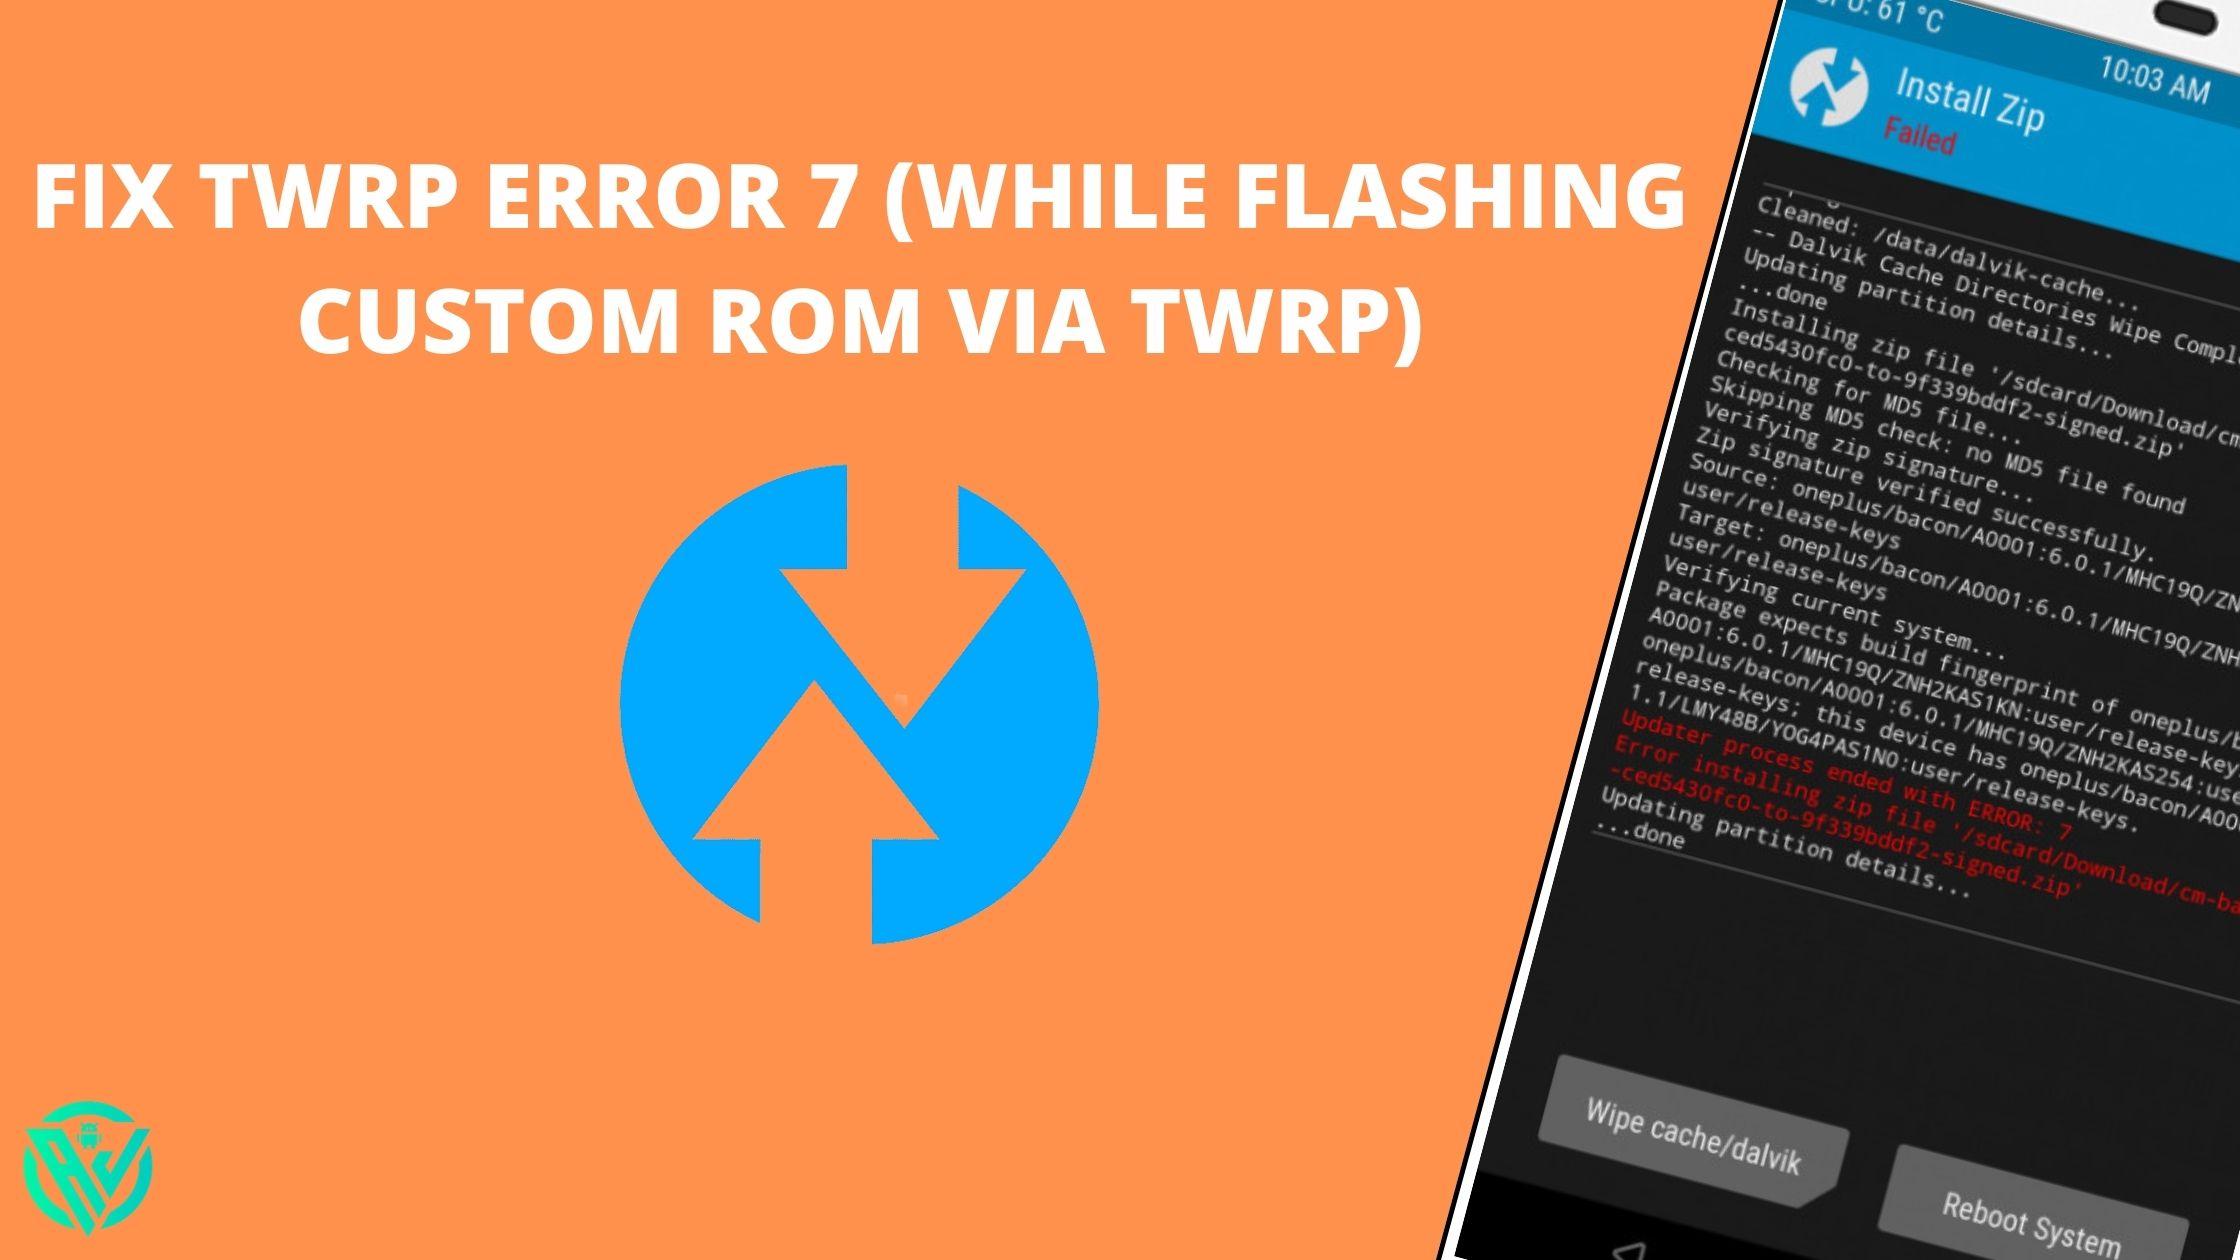 fix twrp error 7